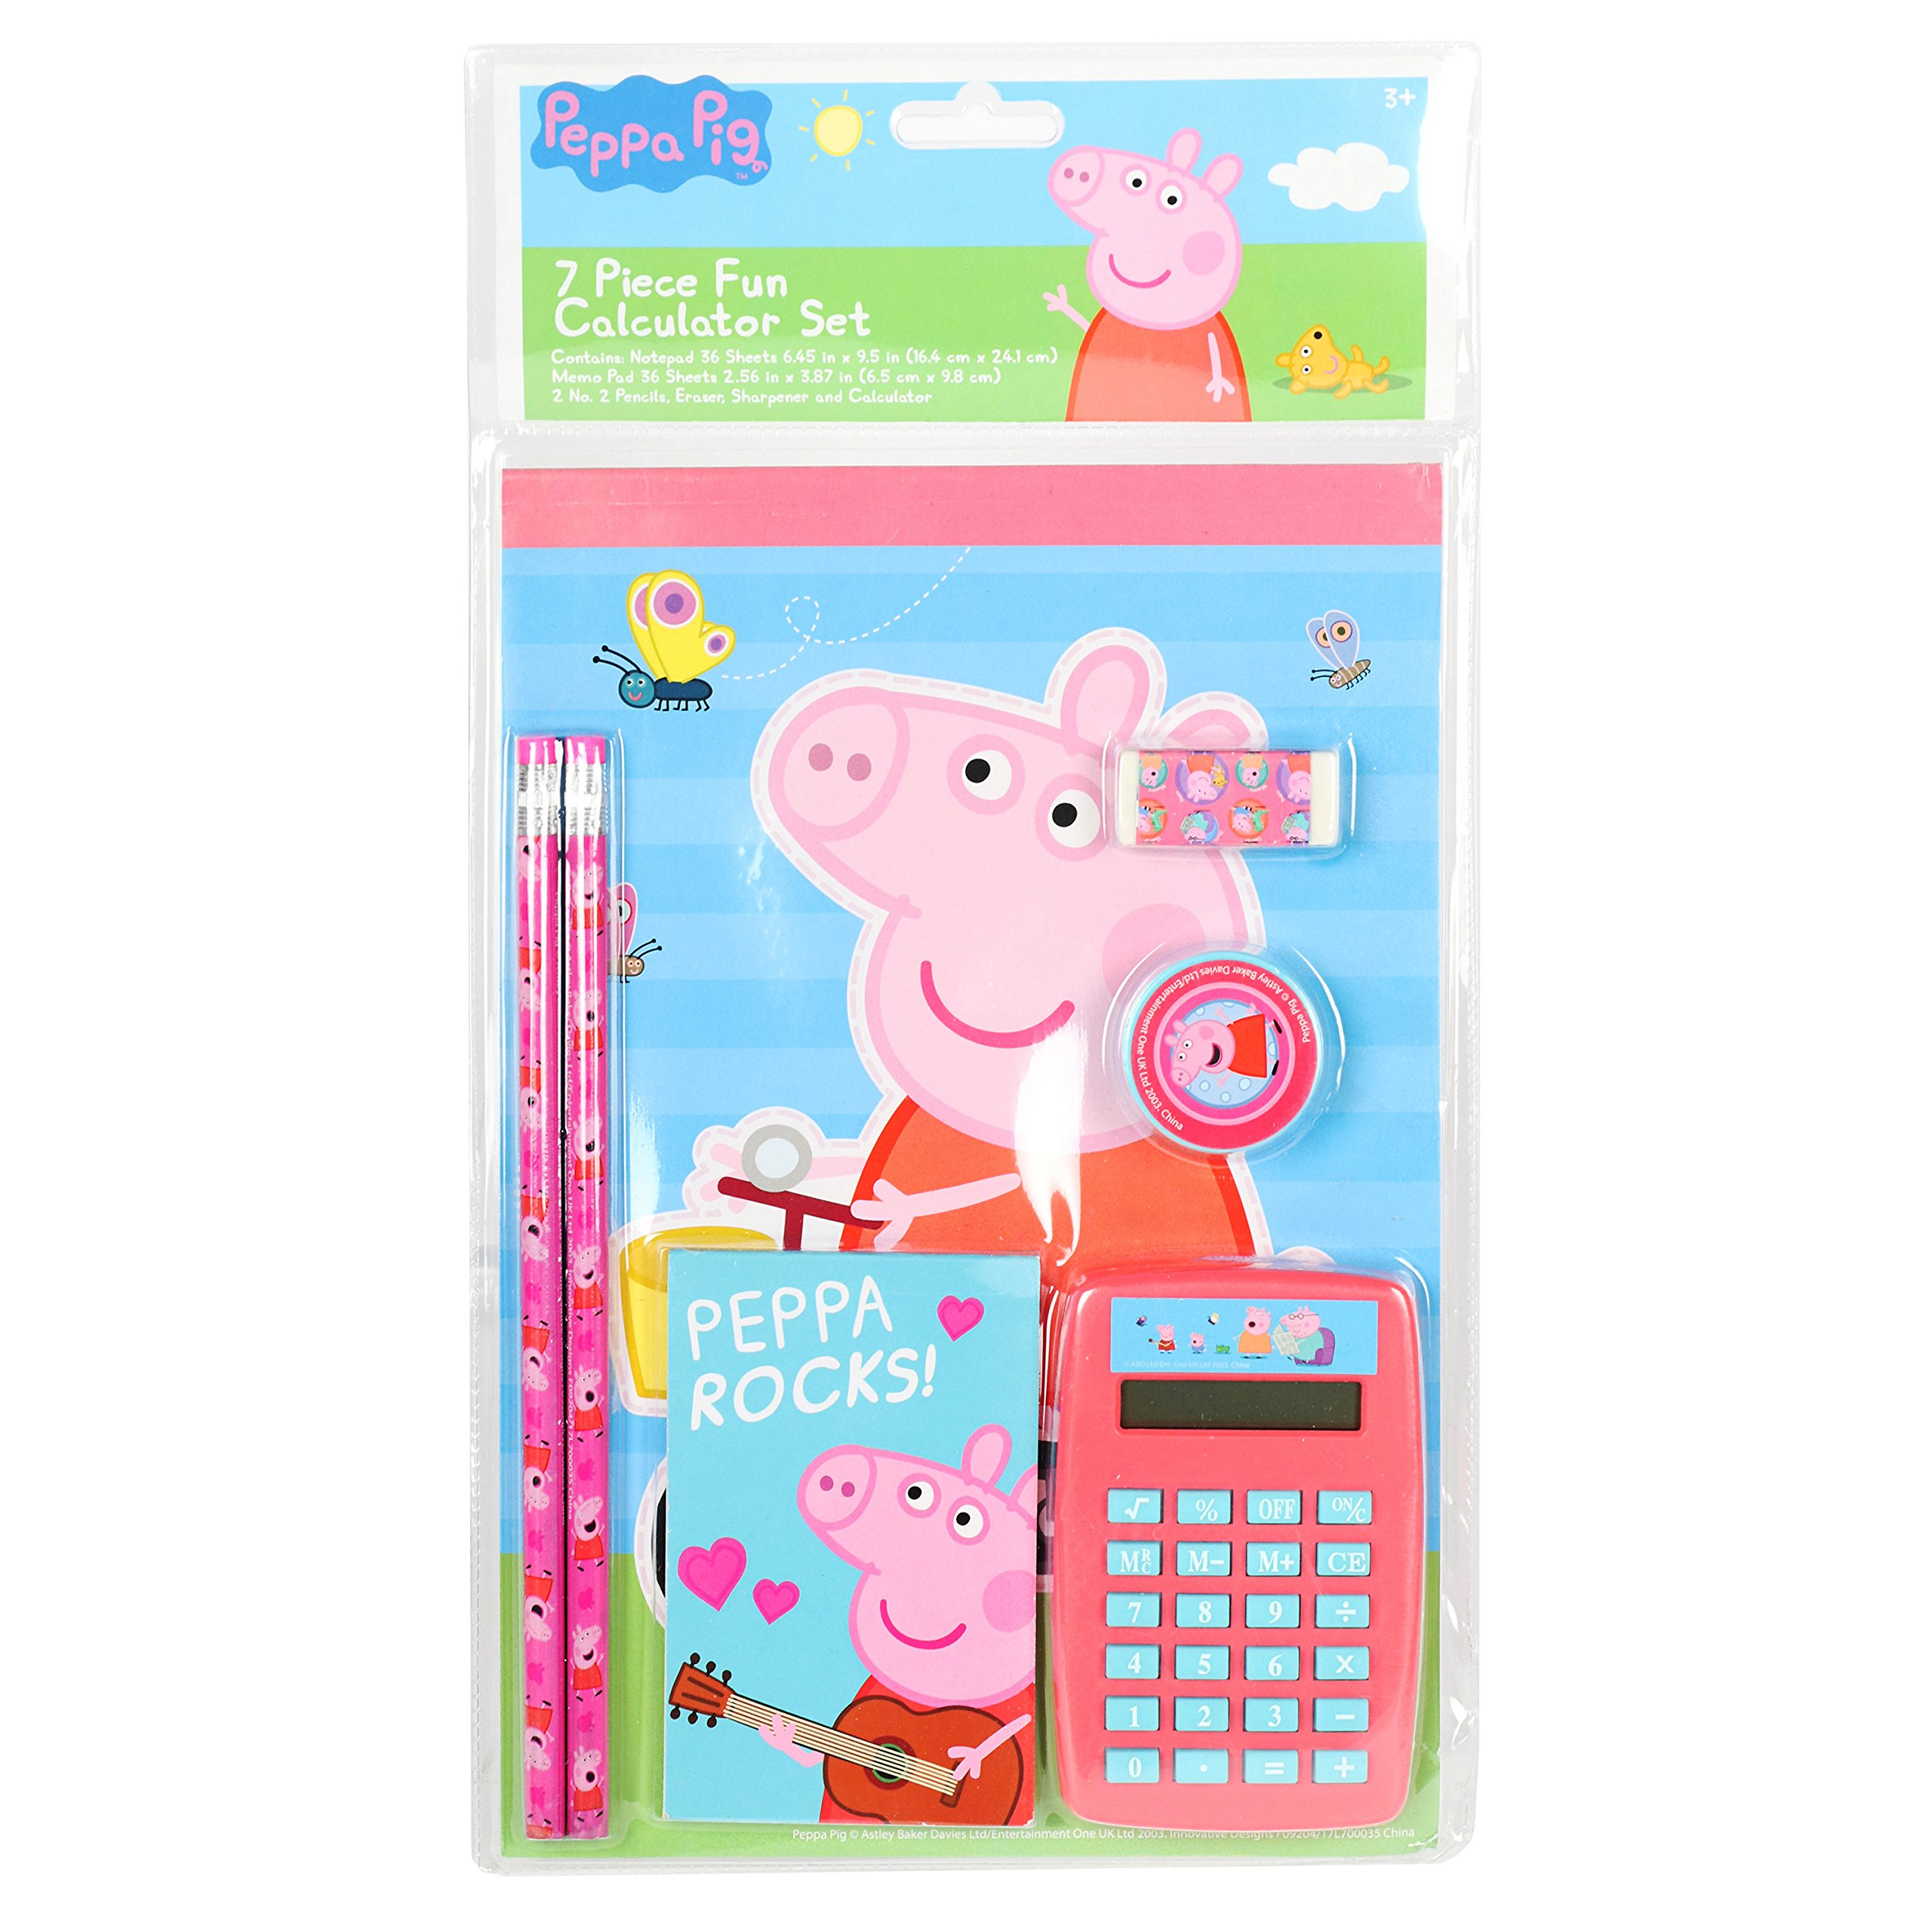 Peppa Pig 7 piece Fun Calculator Set Back to School for Girls